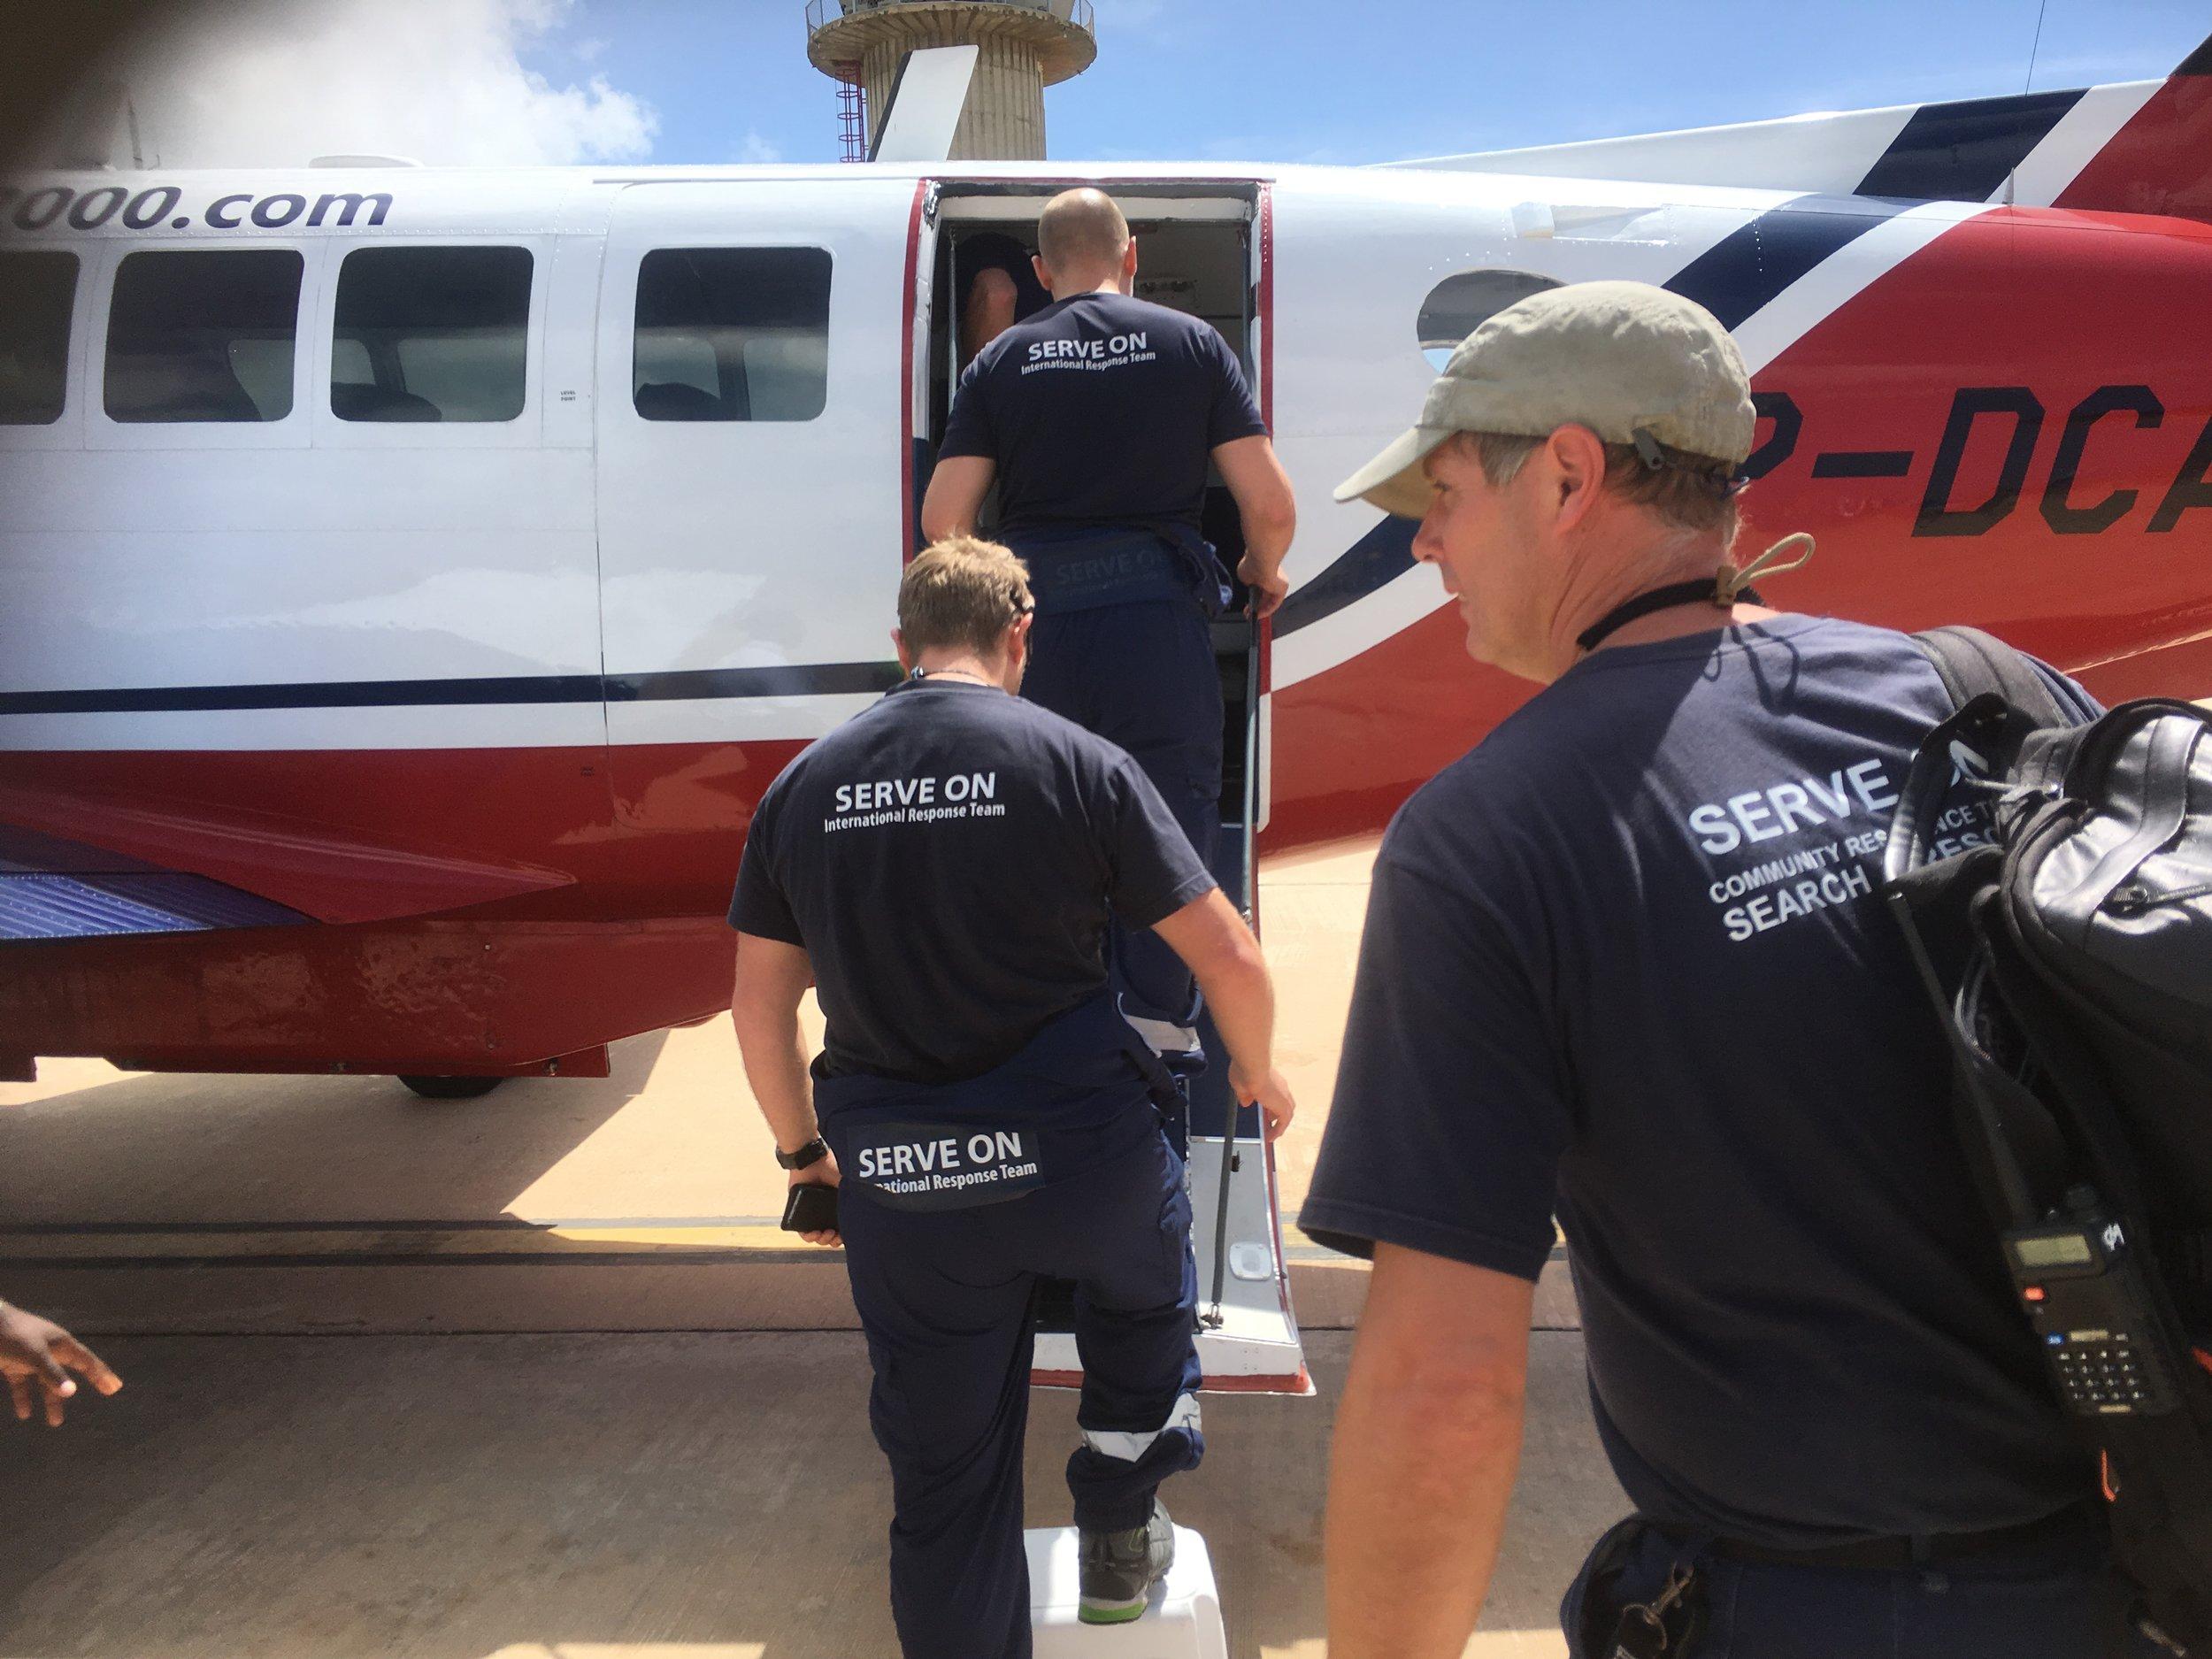 Serve On's International Response Team volunteers head for the British Virgin Islands in the wake of Hurricane Irma in September 2017